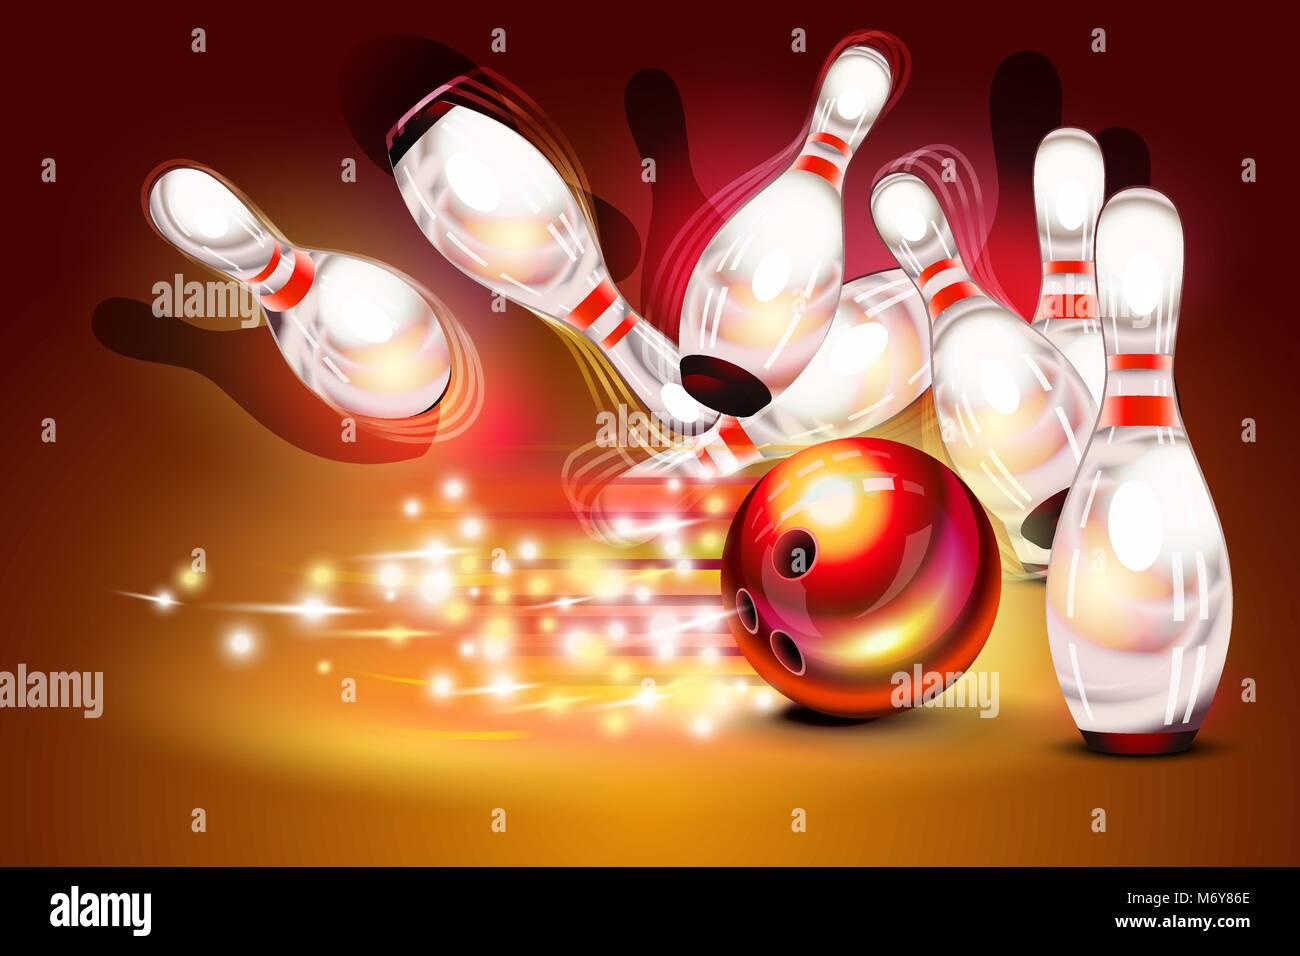 Juego de bowling strike sobre fondo rojo oscuro Imagen De Stock